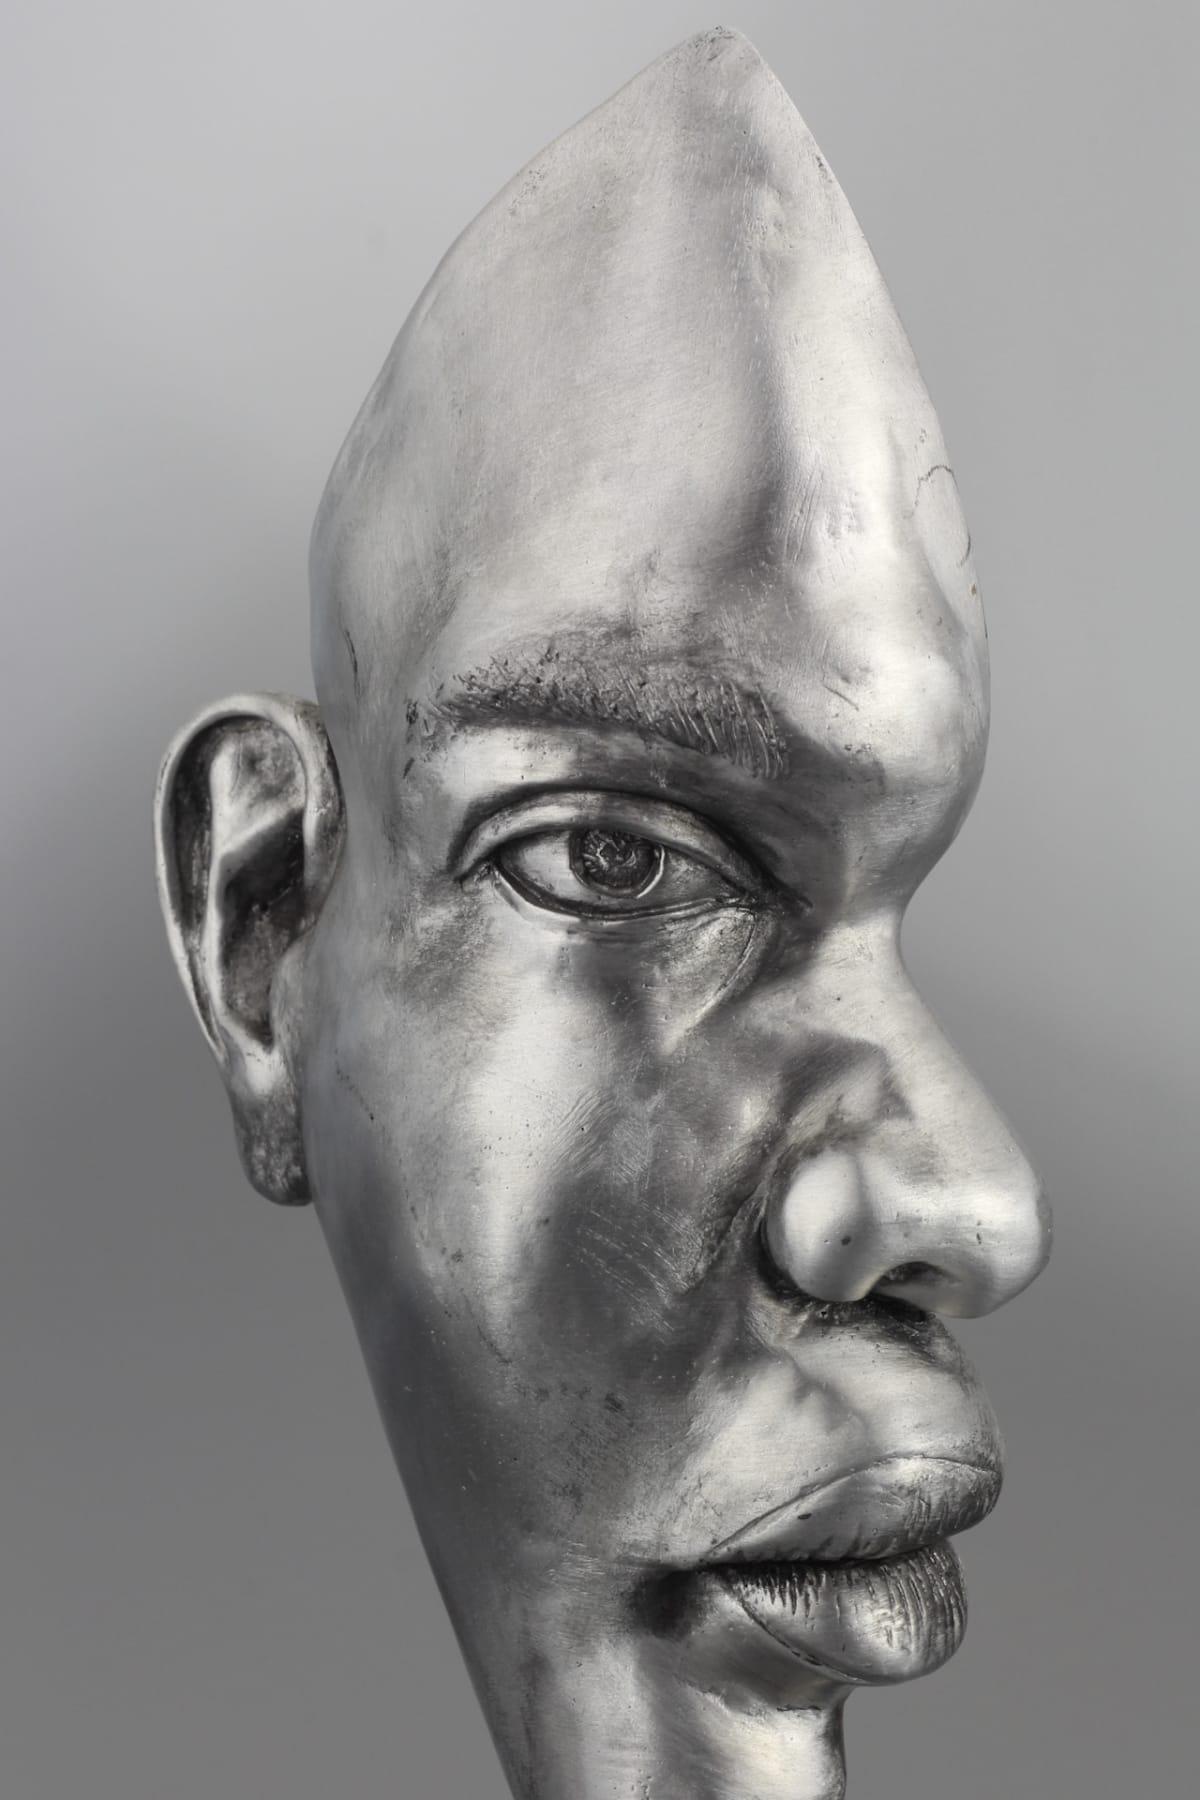 Mirek Brandejs Mask 1, 2018 Aluminium Sculpture 34 x 10 x 10 cm 13 3/8 x 4 x 4 in Edition 1 of 25